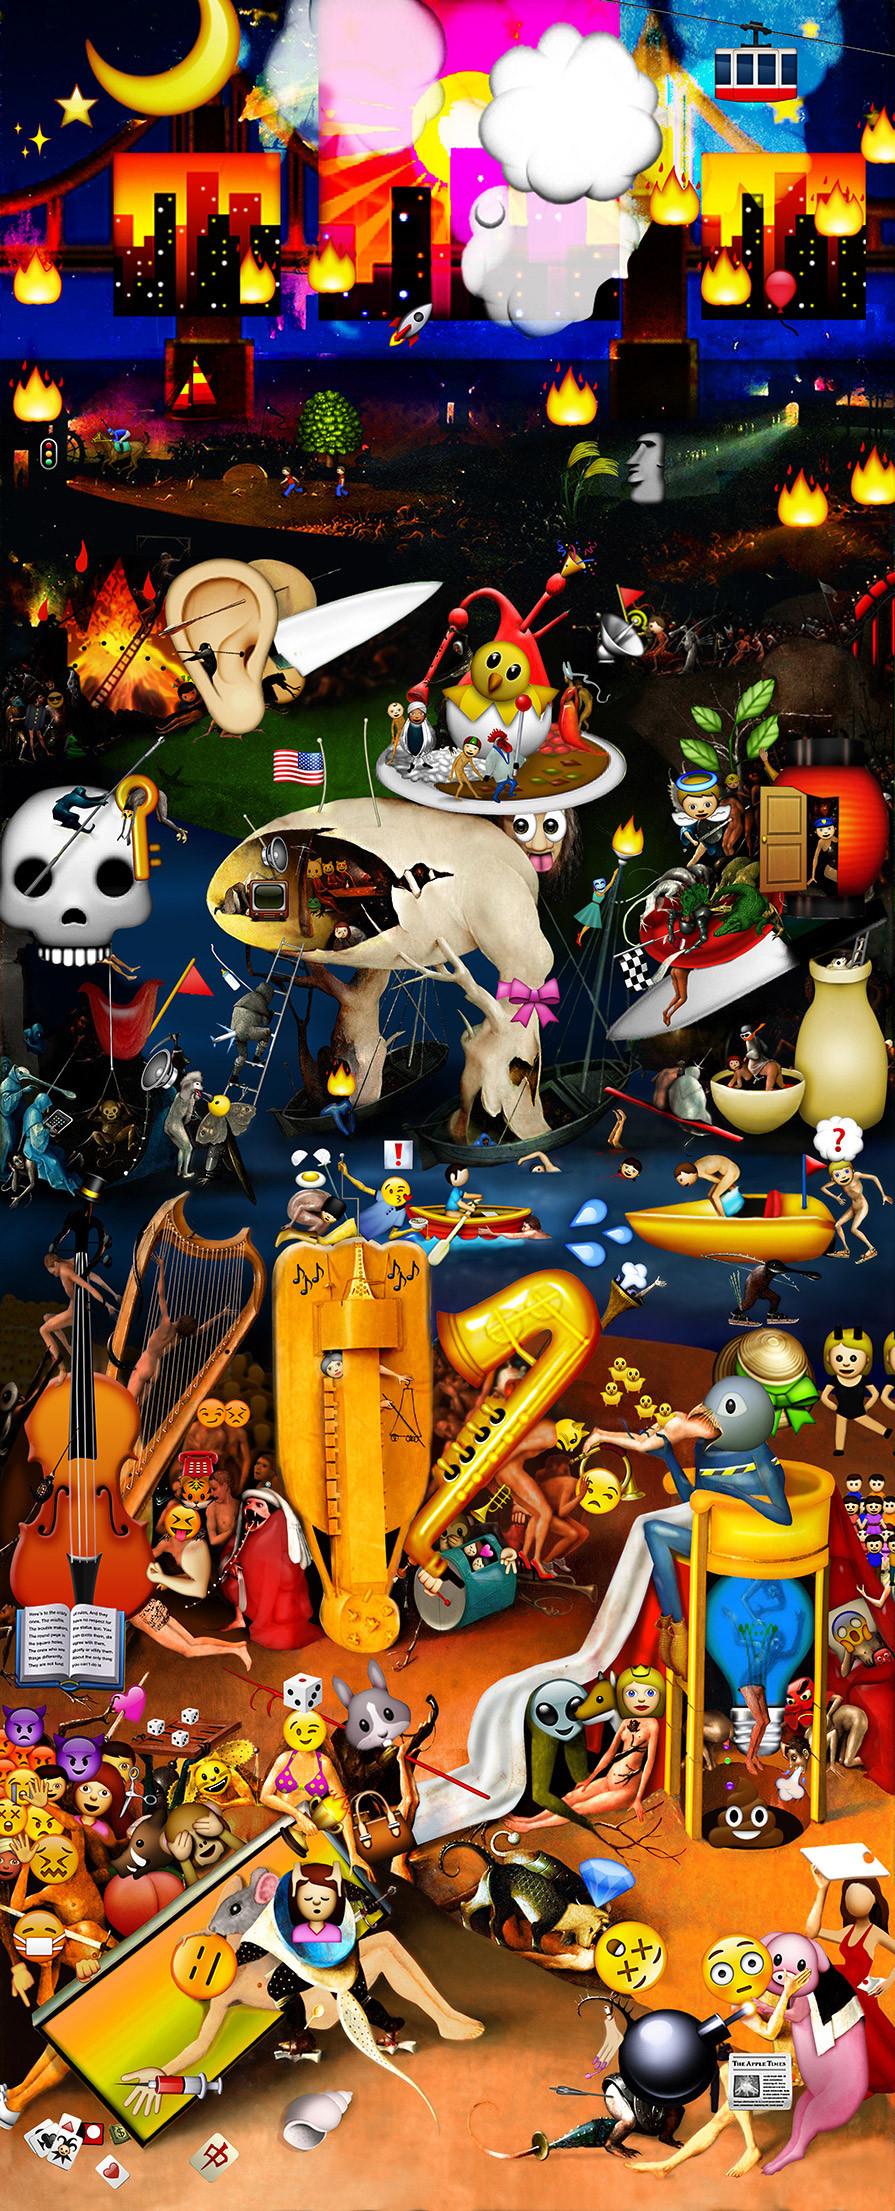 The Garden of Emoji Delights, Carla Gannis (source: http://www.huffingtonpost.com/2013/12/13/emoji-bosch_n_4435039.html?ncid=edlinkusaolp00000003)